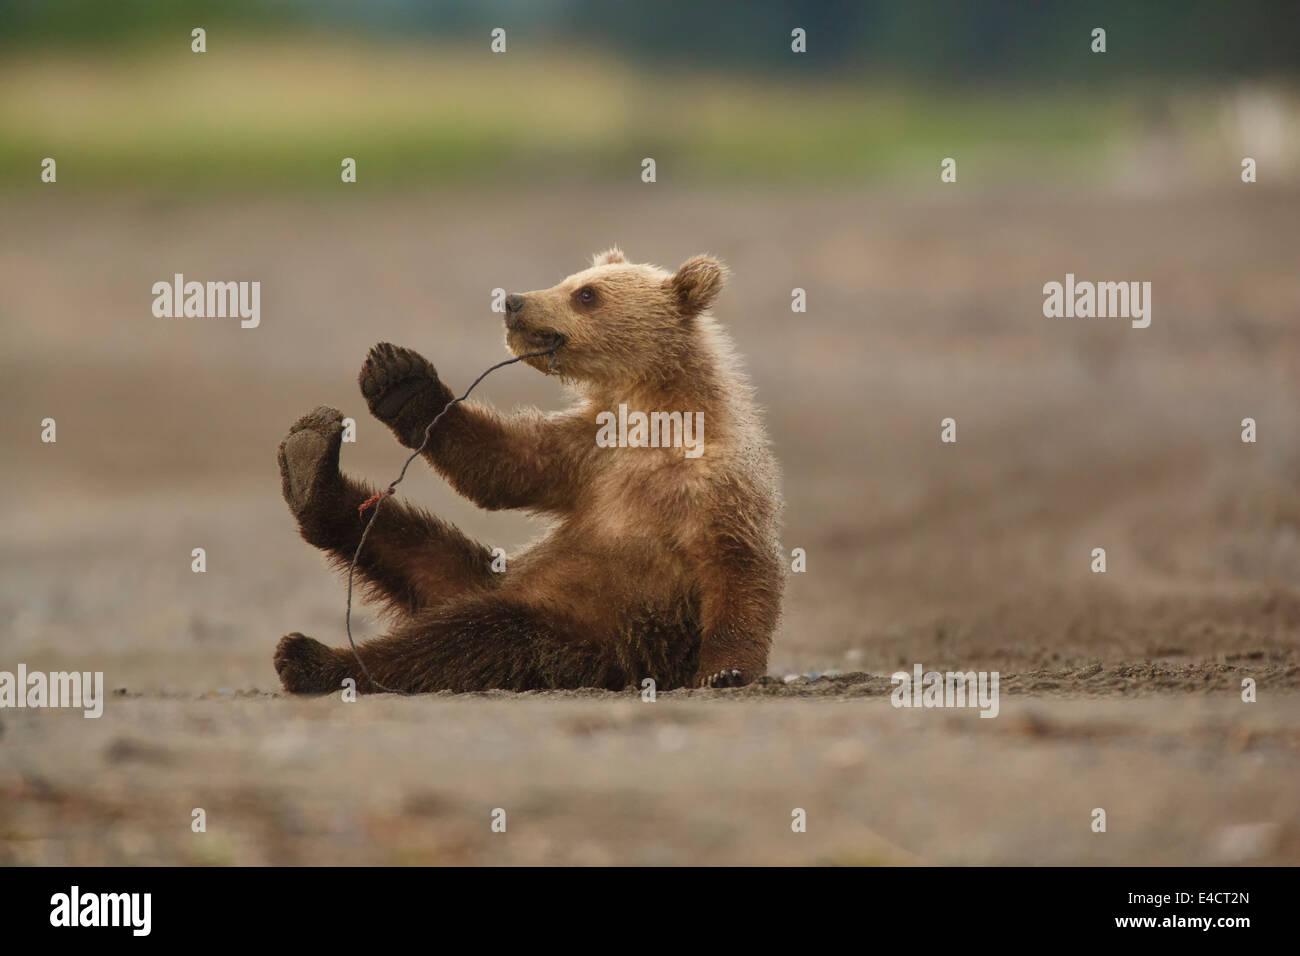 A Brown or Grizzly Bear cub, Lake Clark National Park, Alaska. - Stock Image